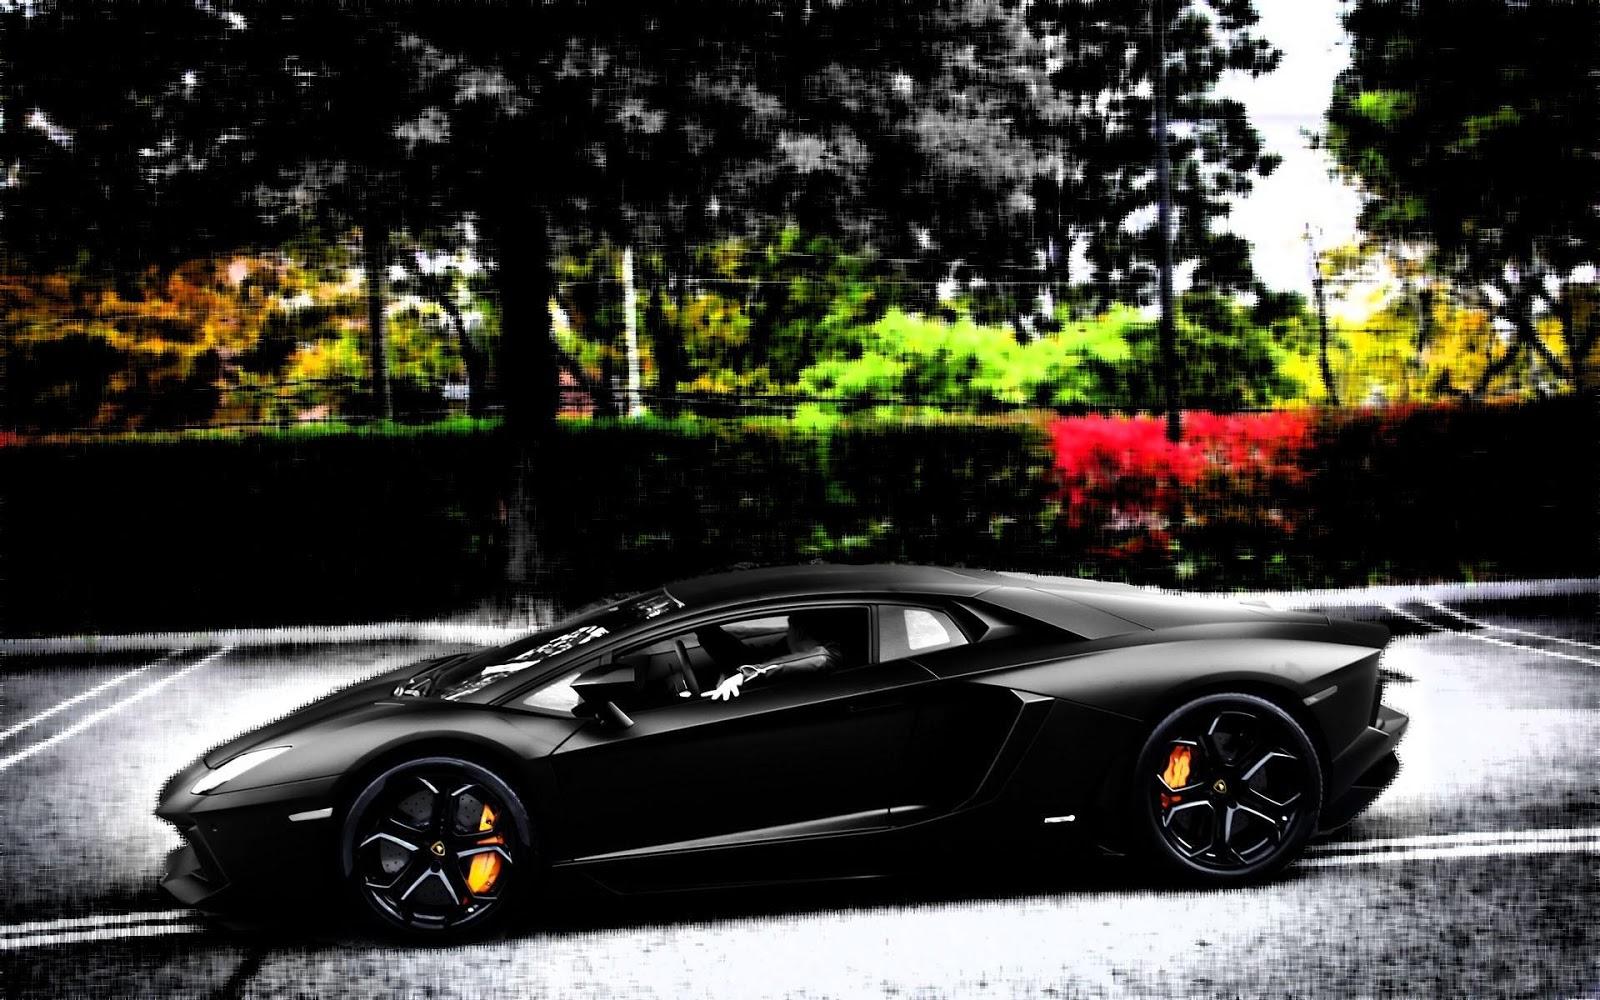 Black Car Lamborghini   Full HD Desktop Wallpapers 1080p